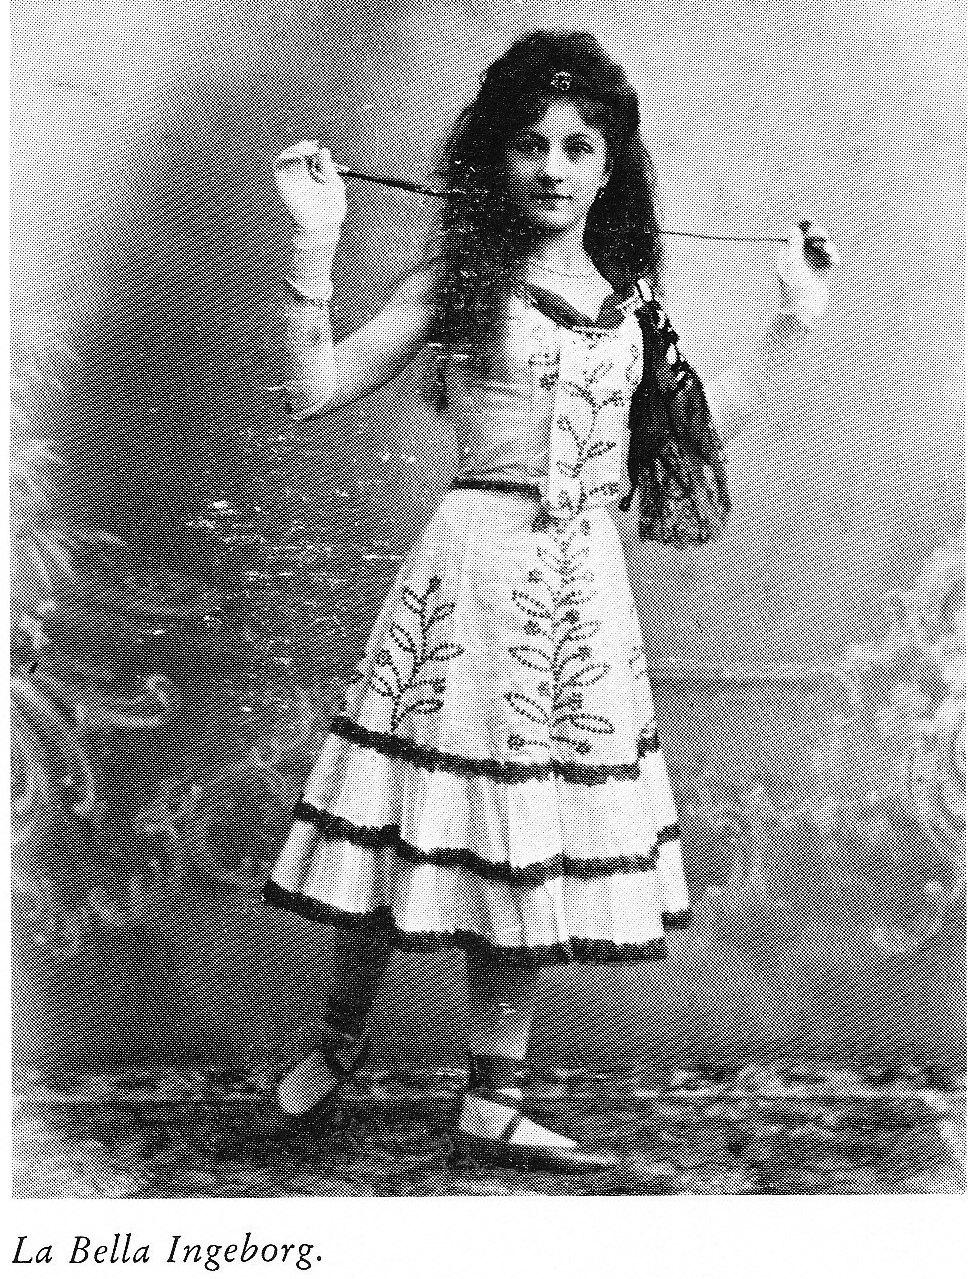 La Bella Ingeborg